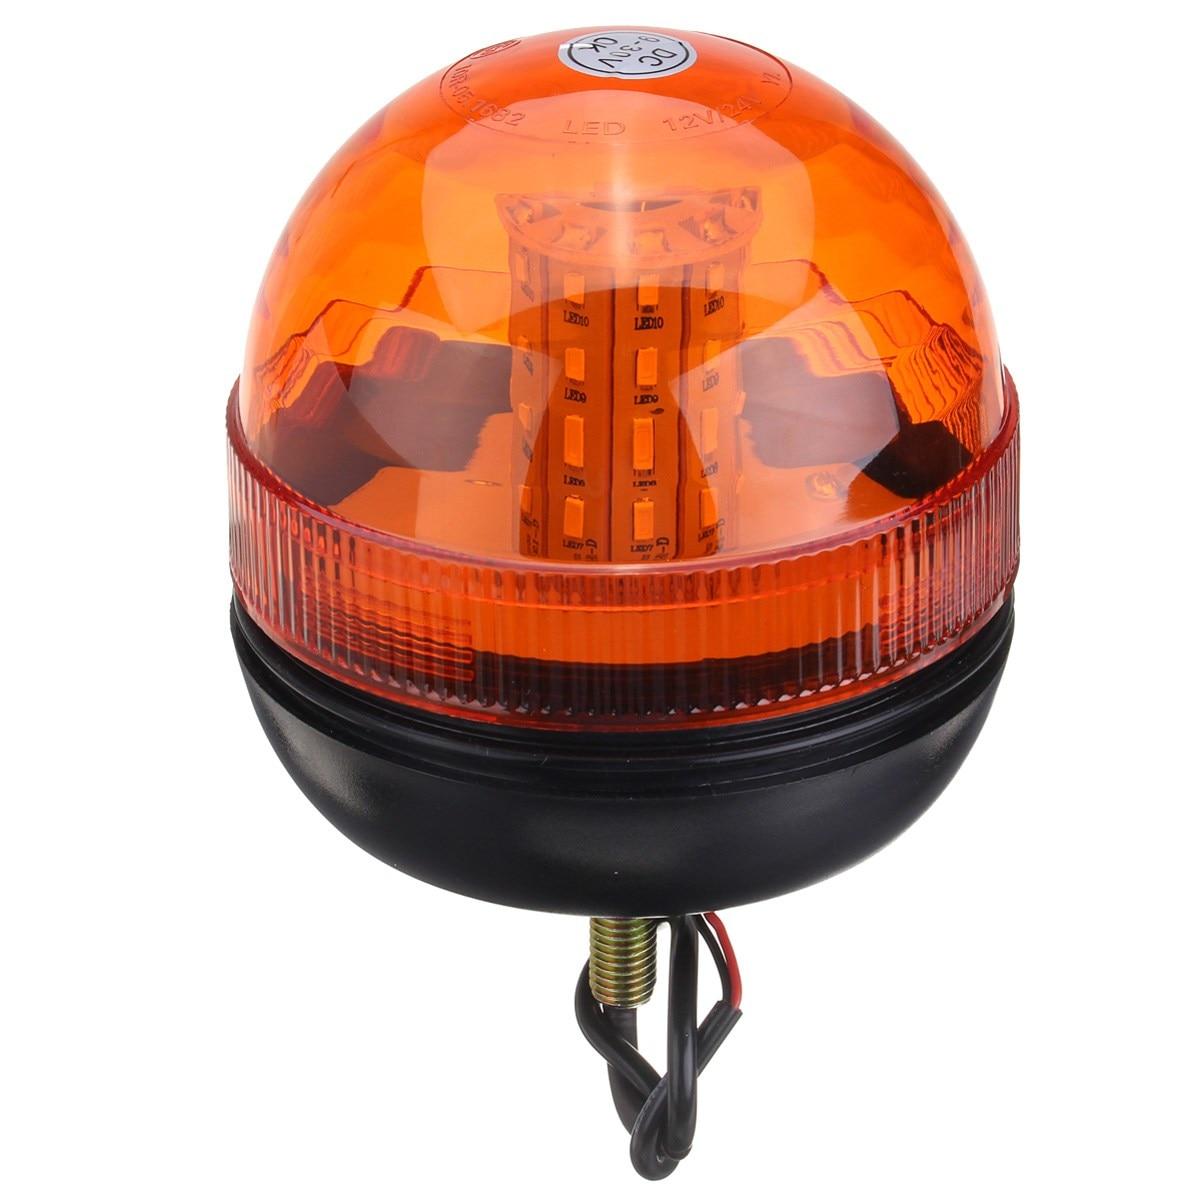 NEW LED Rotating Flashing Amber Beacon Flexible 1 Bolt Tractor Warning Light 9-30V Traffic Light Roadway